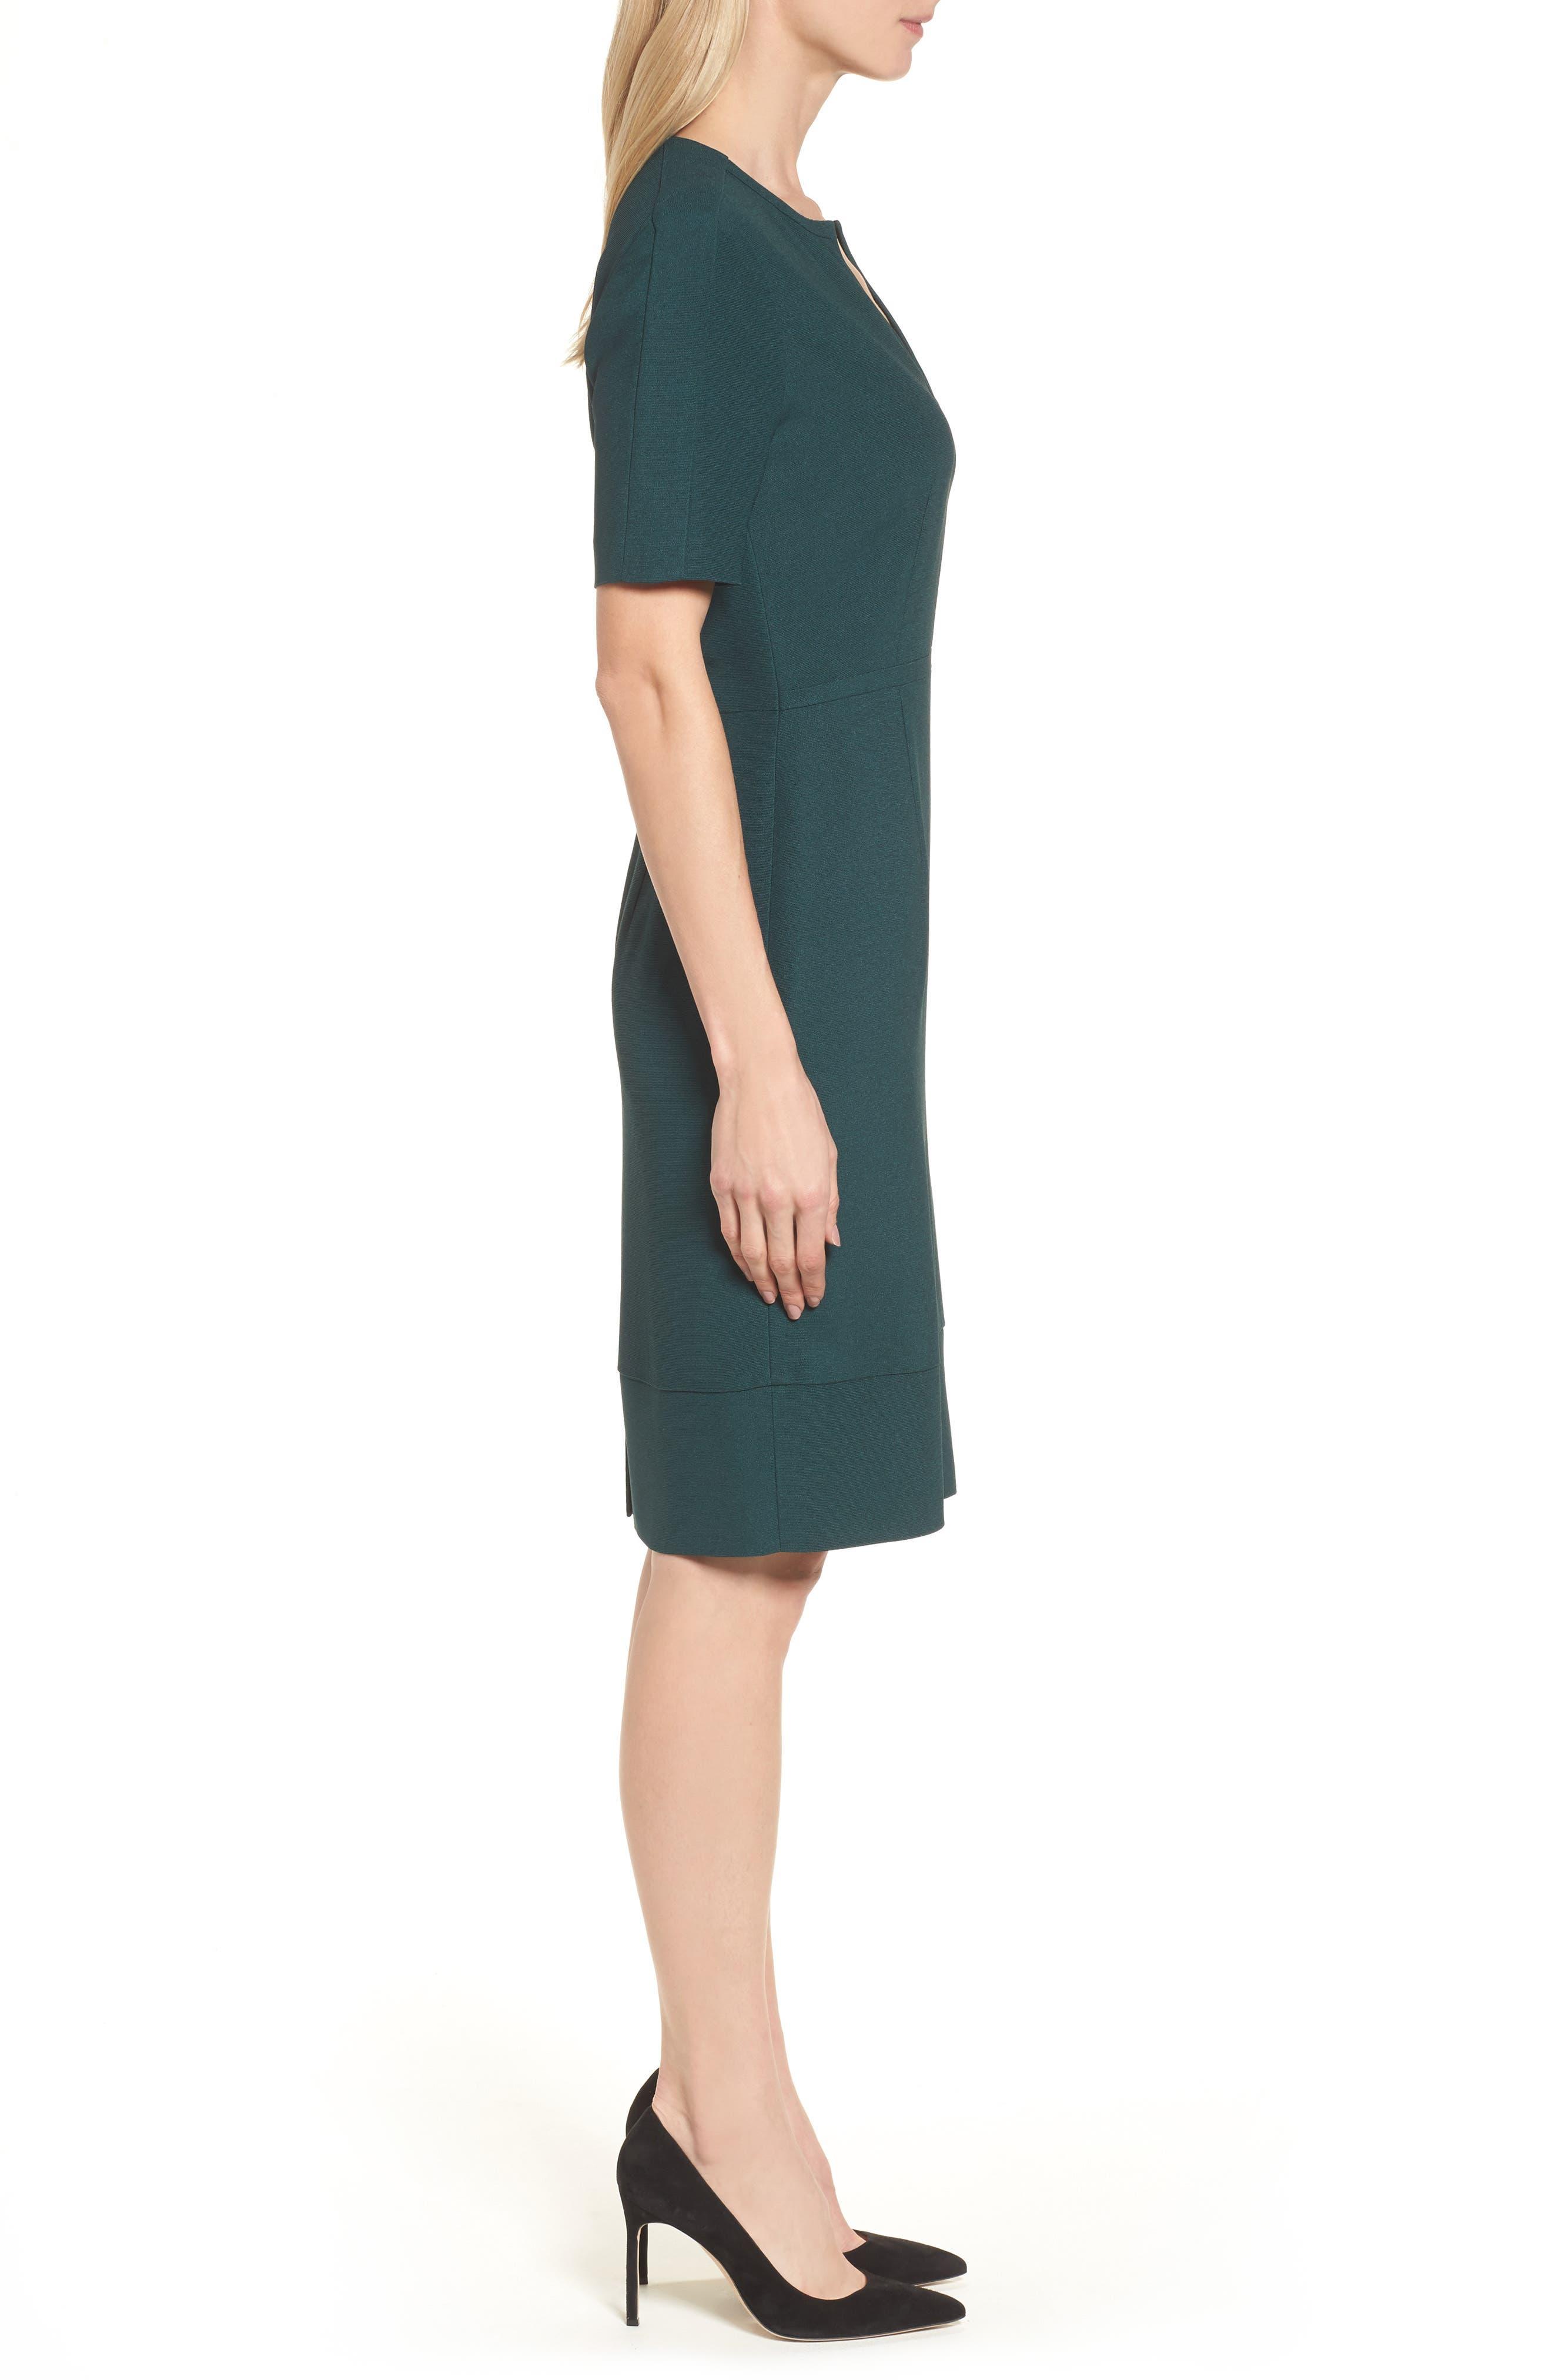 Dalesana Sheath Dress,                             Alternate thumbnail 3, color,                             Peacock Green